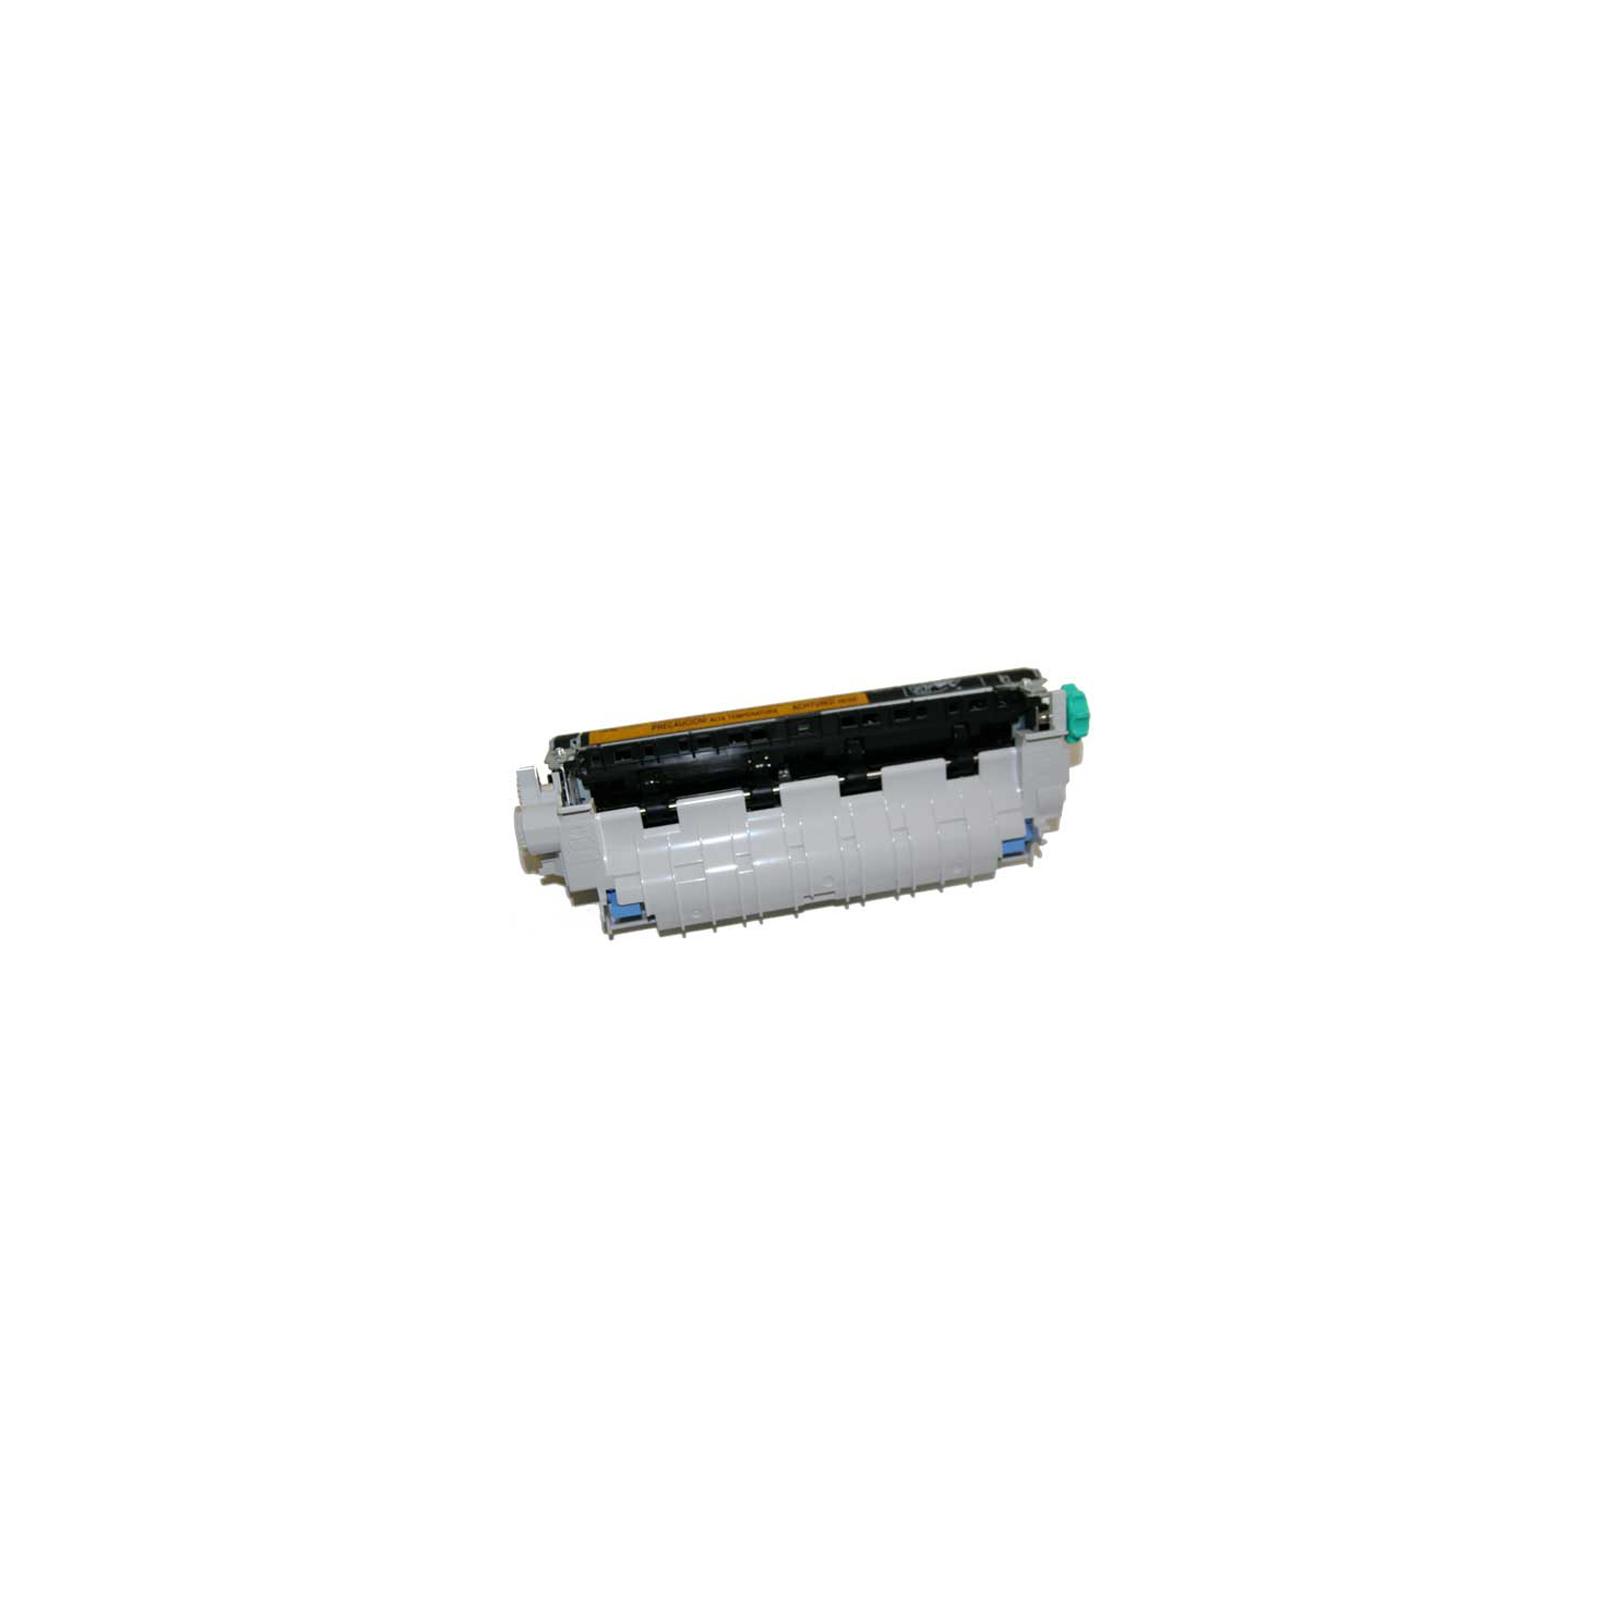 Узел закрепления изображения HP LJ 4250/4350 (RM1-1083)